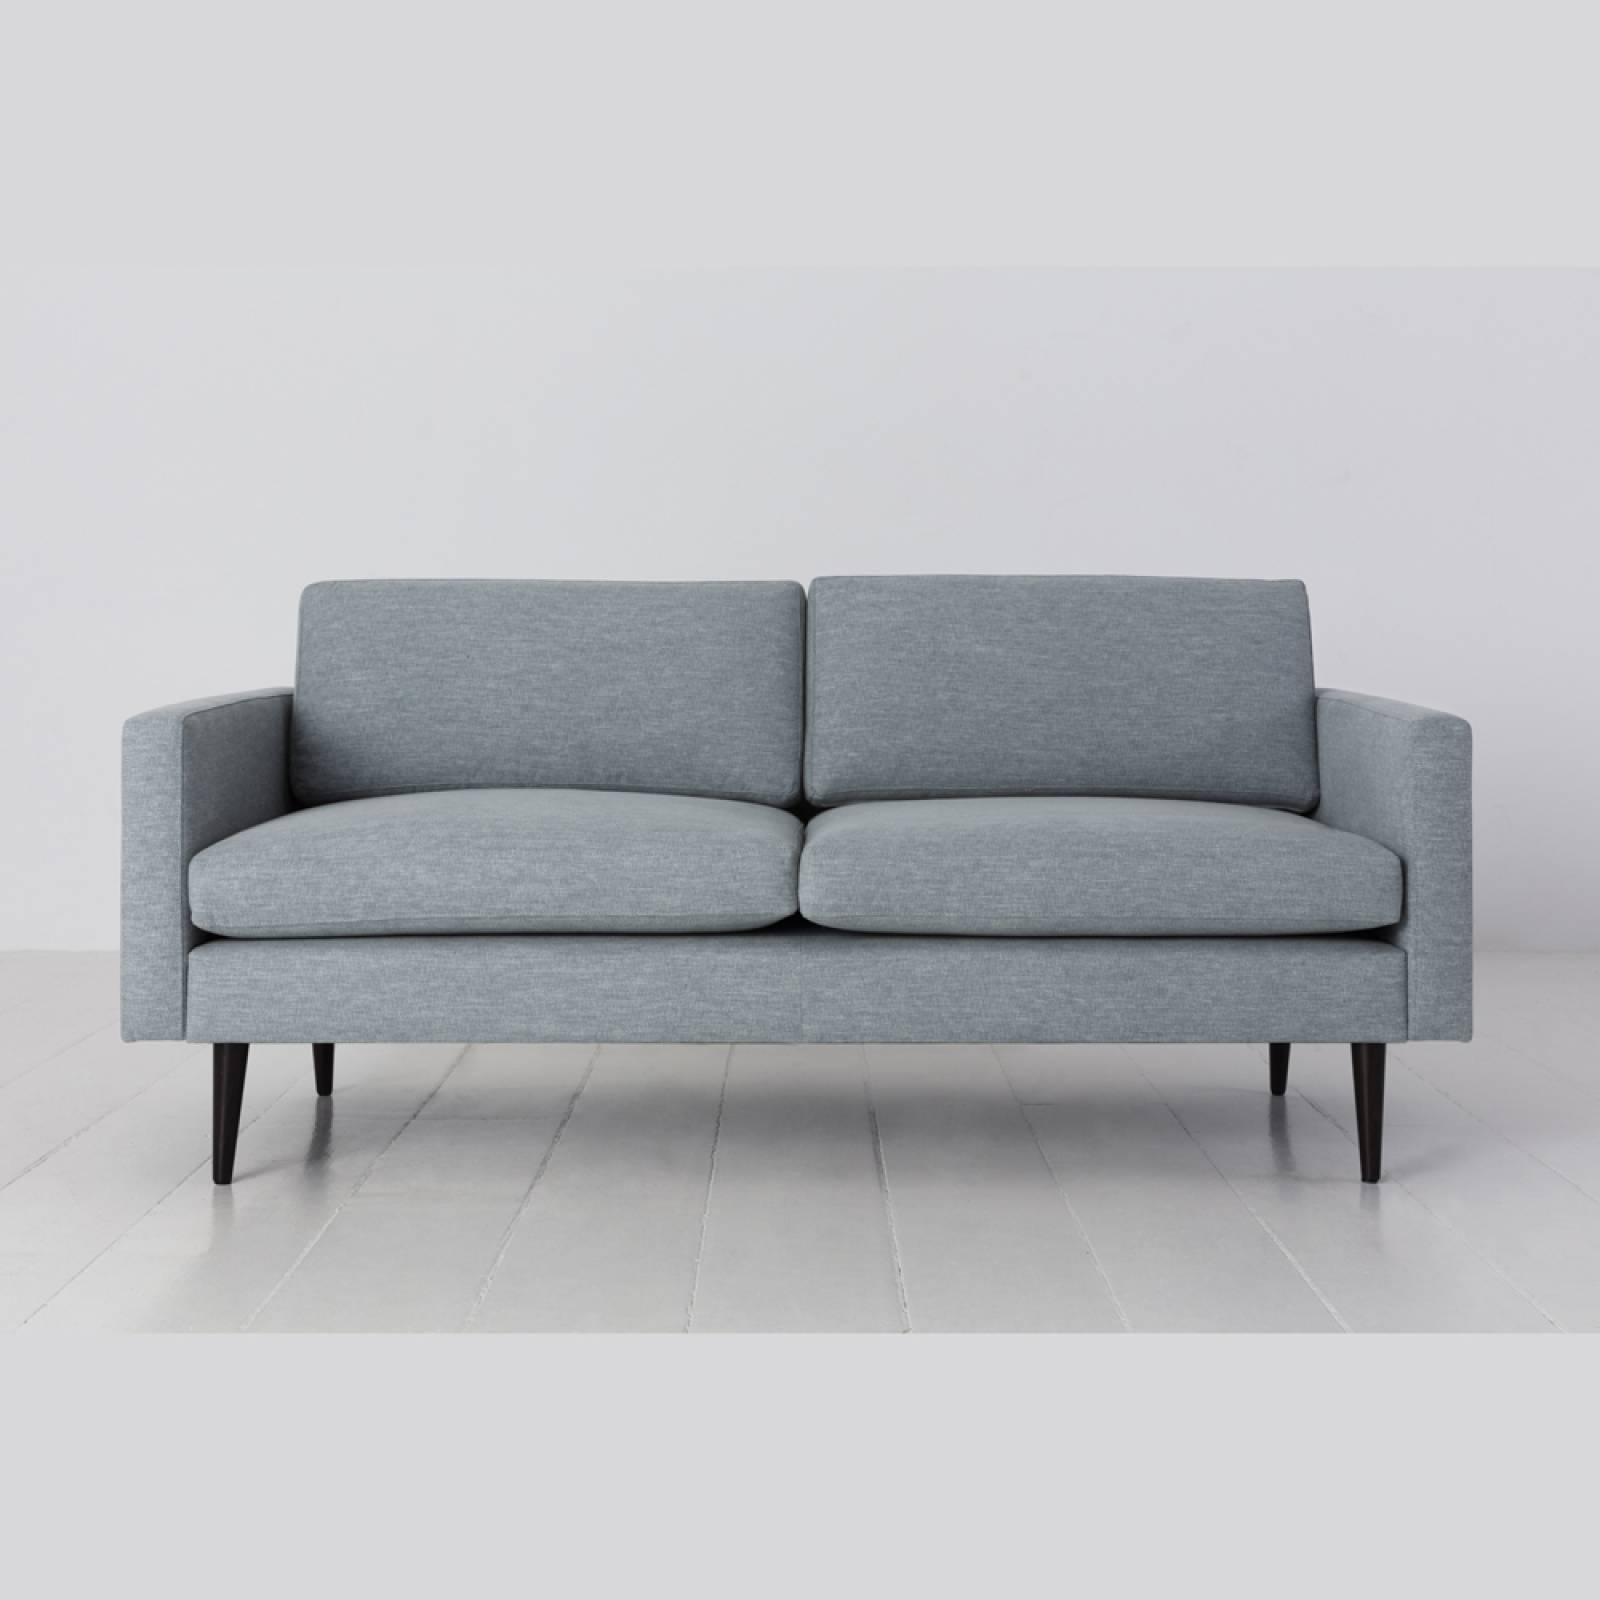 Swyft - Model 01 - 2 Seater Sofa - Linen Seaglass